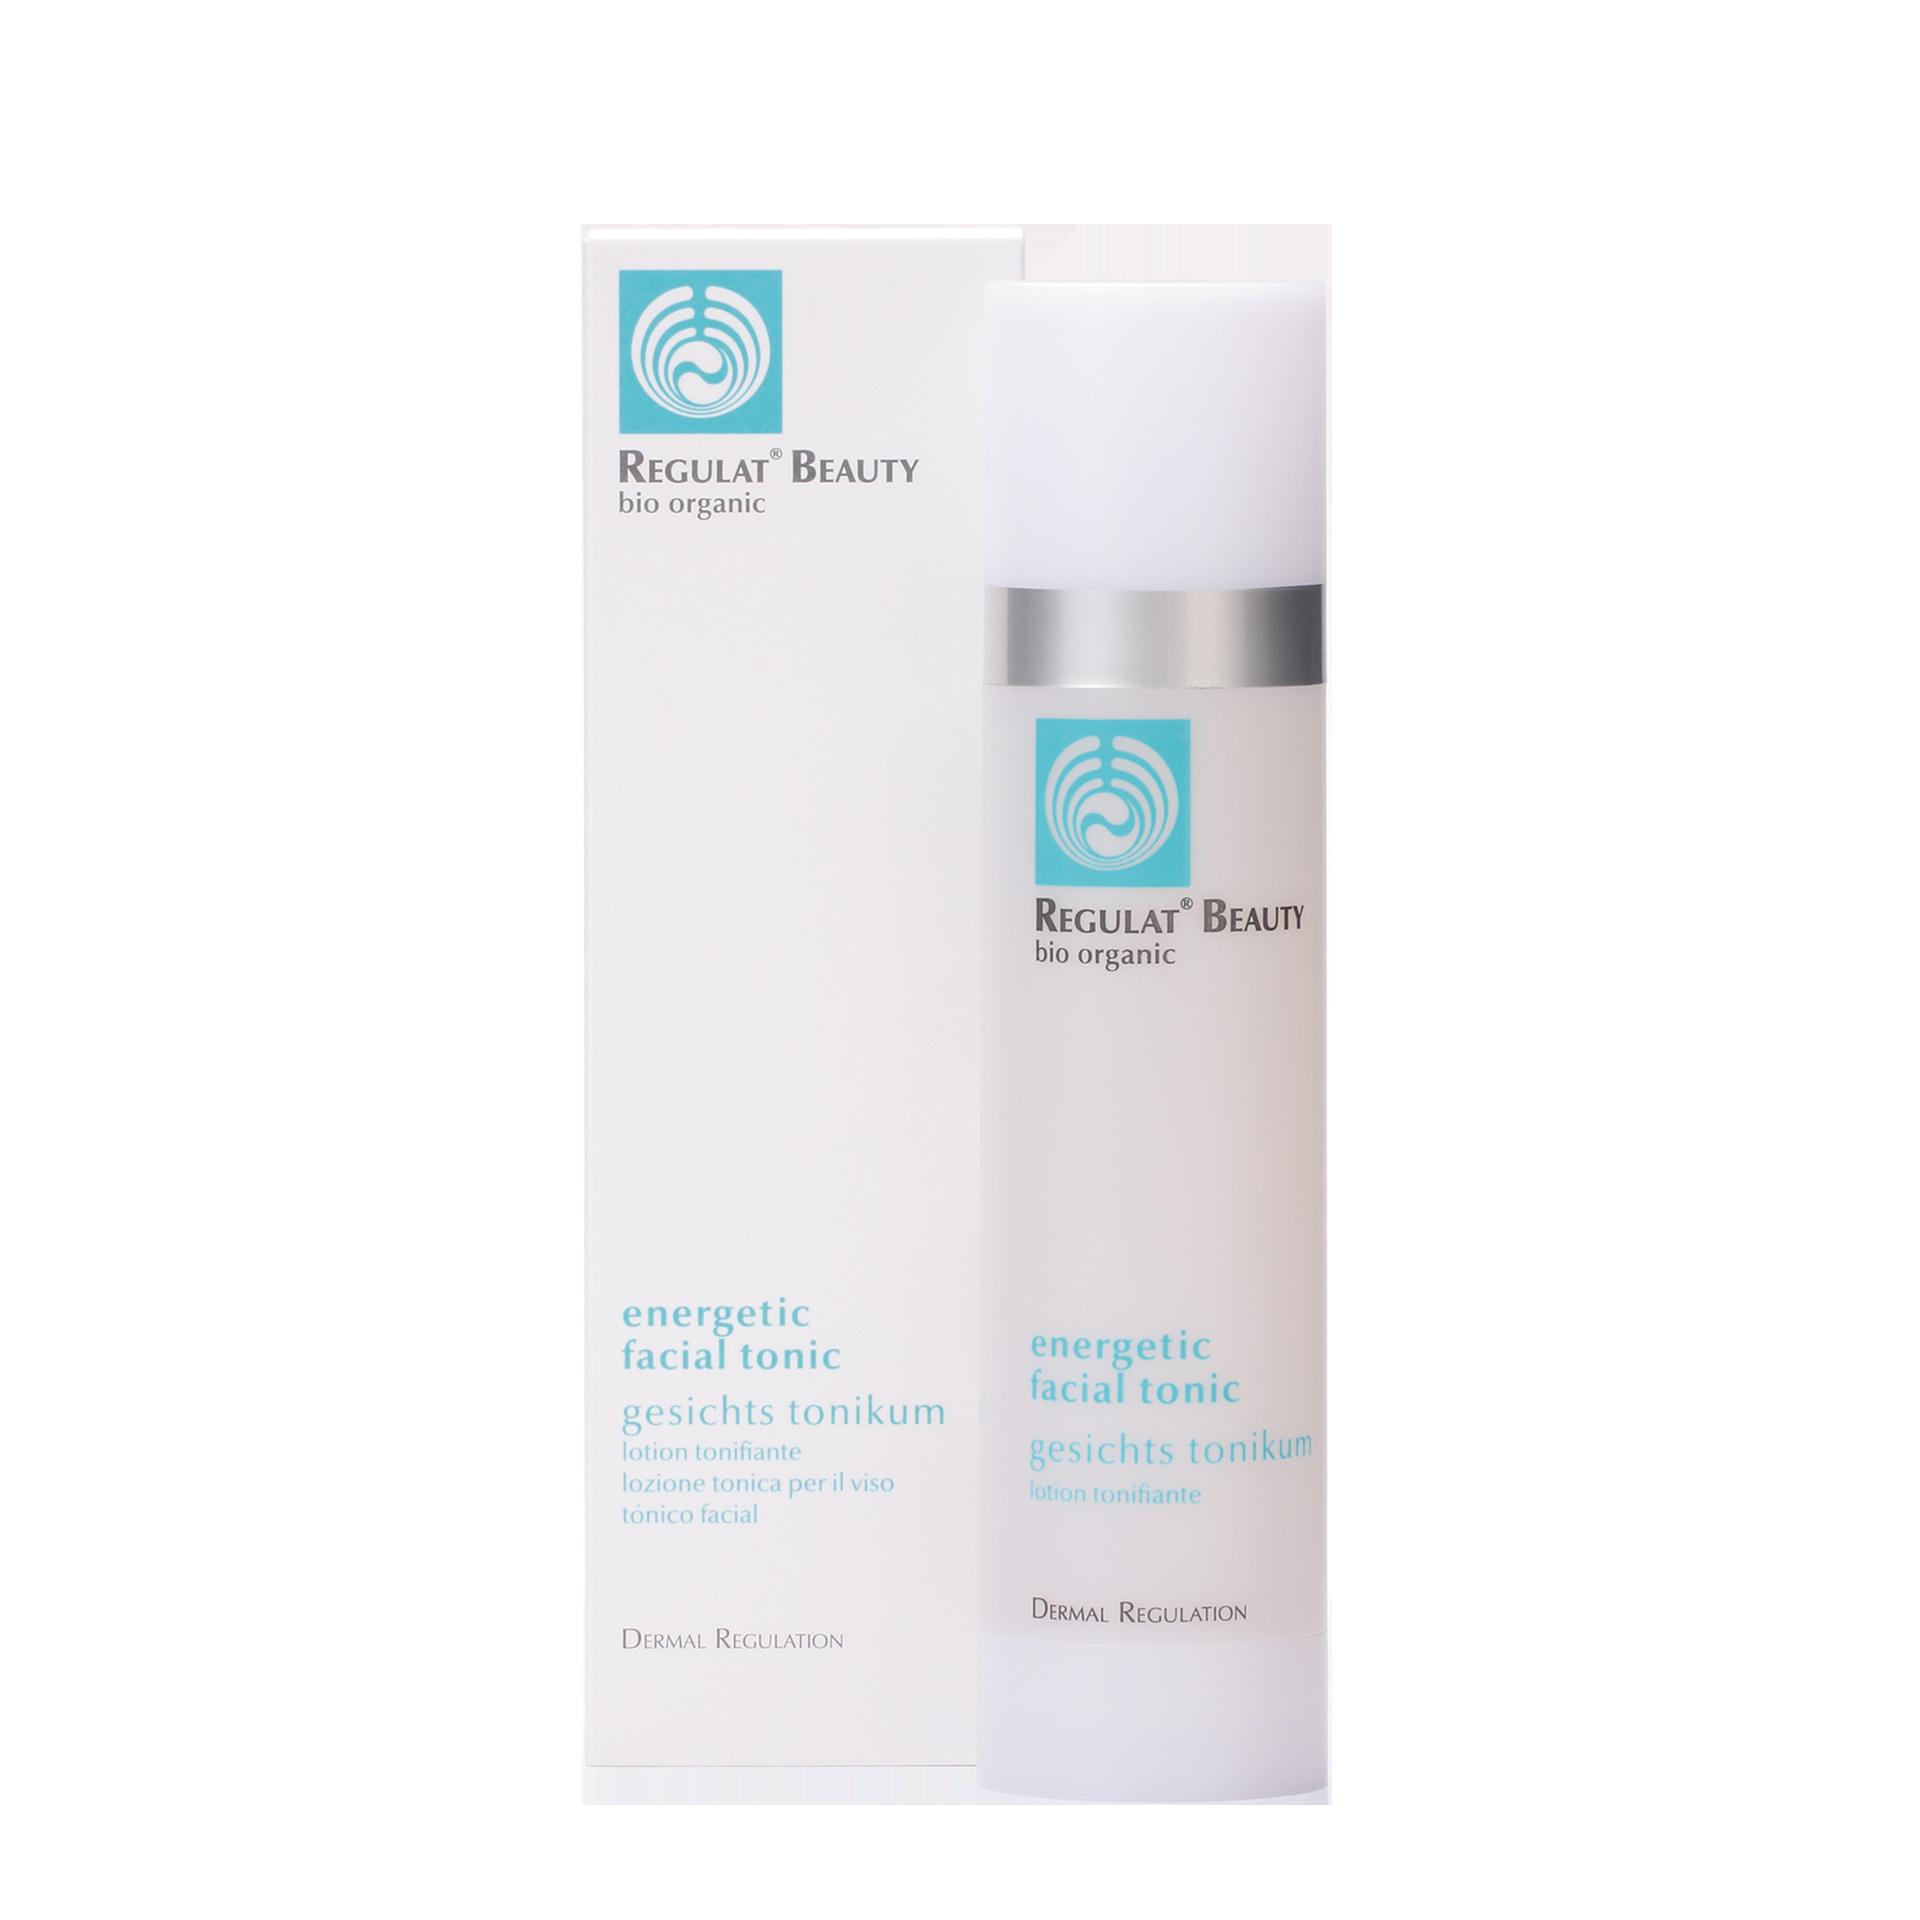 Regulat Beauty, Gesichtstonikum, 150 ml